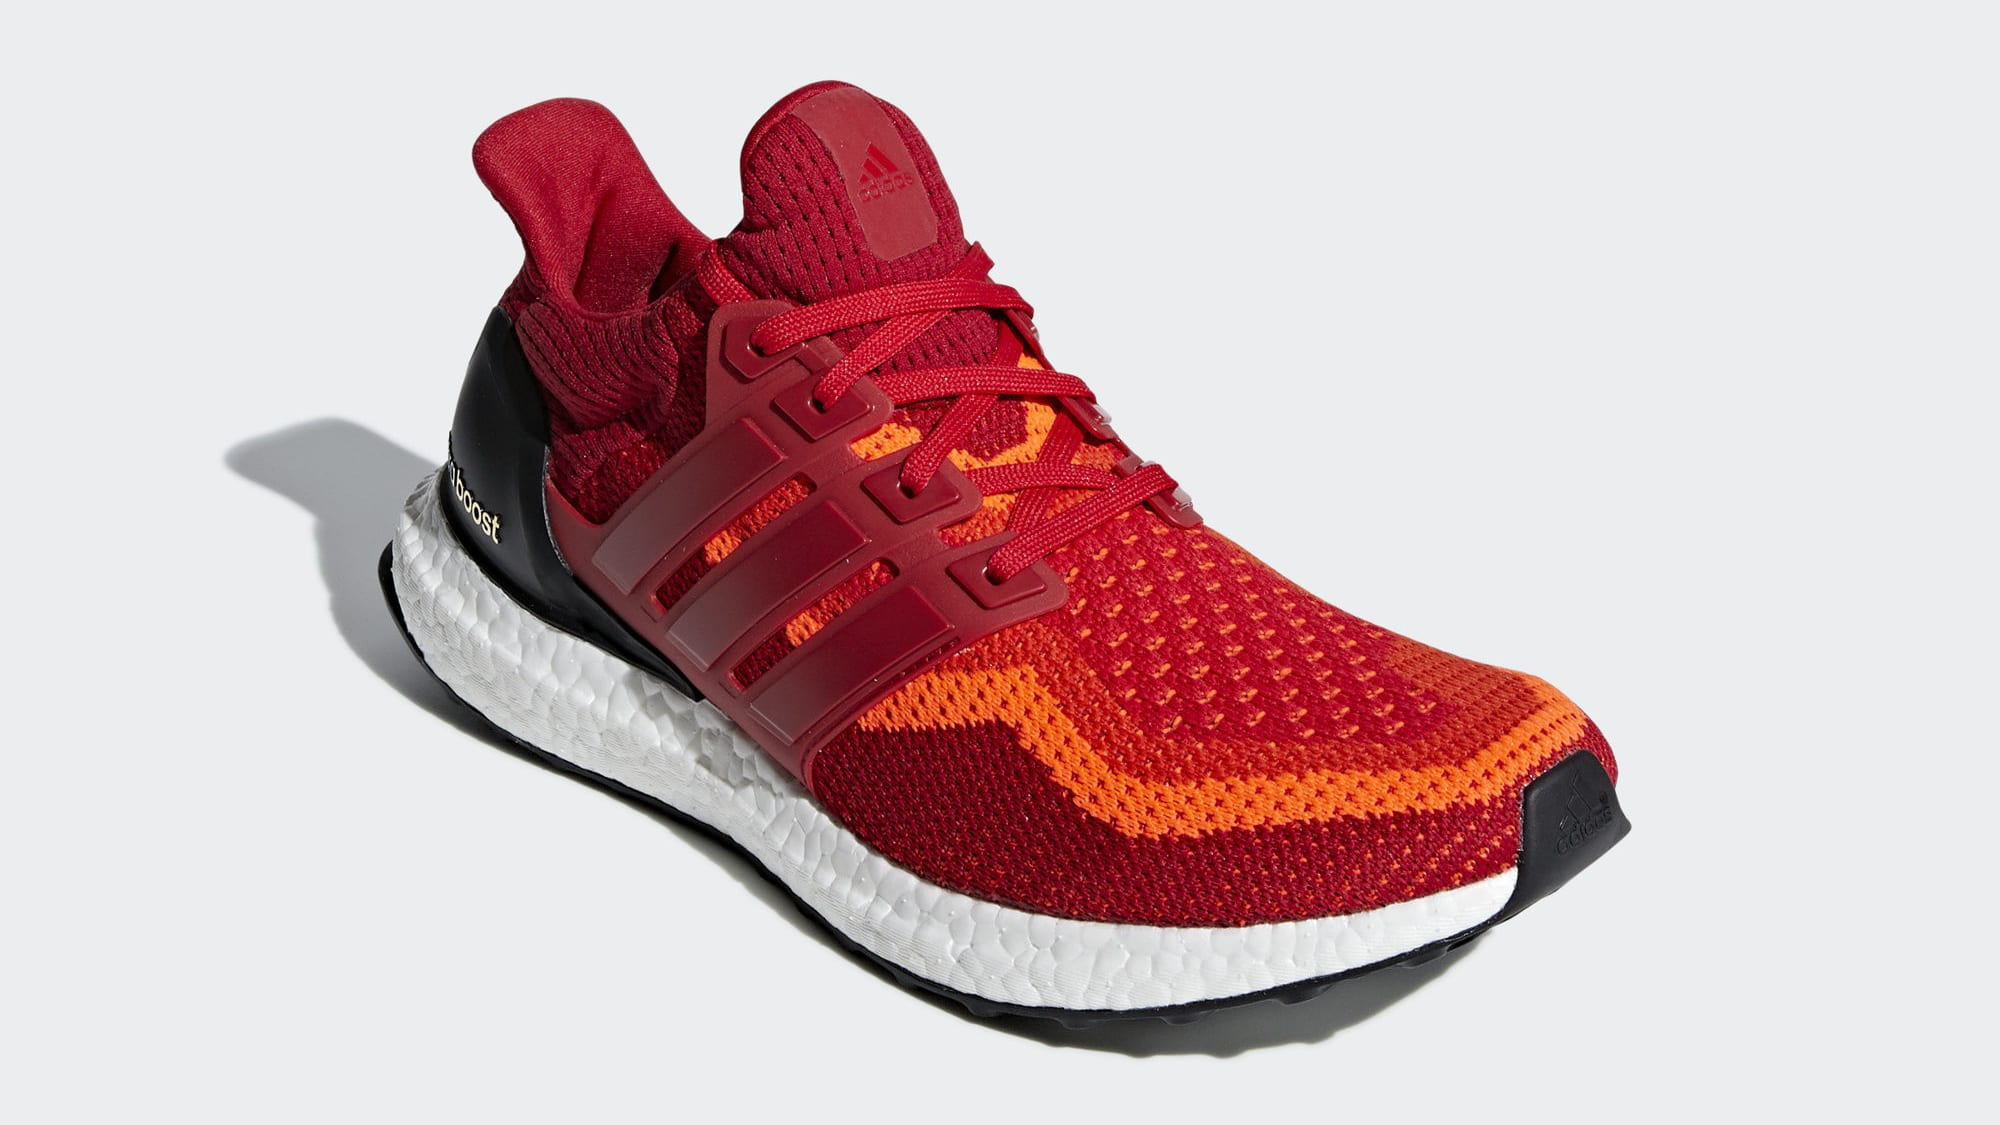 4beae69d9d8f9 ... sweden image via adidas adidas ultra boost 2 0 red gradient aq4006  5e25c 6e671